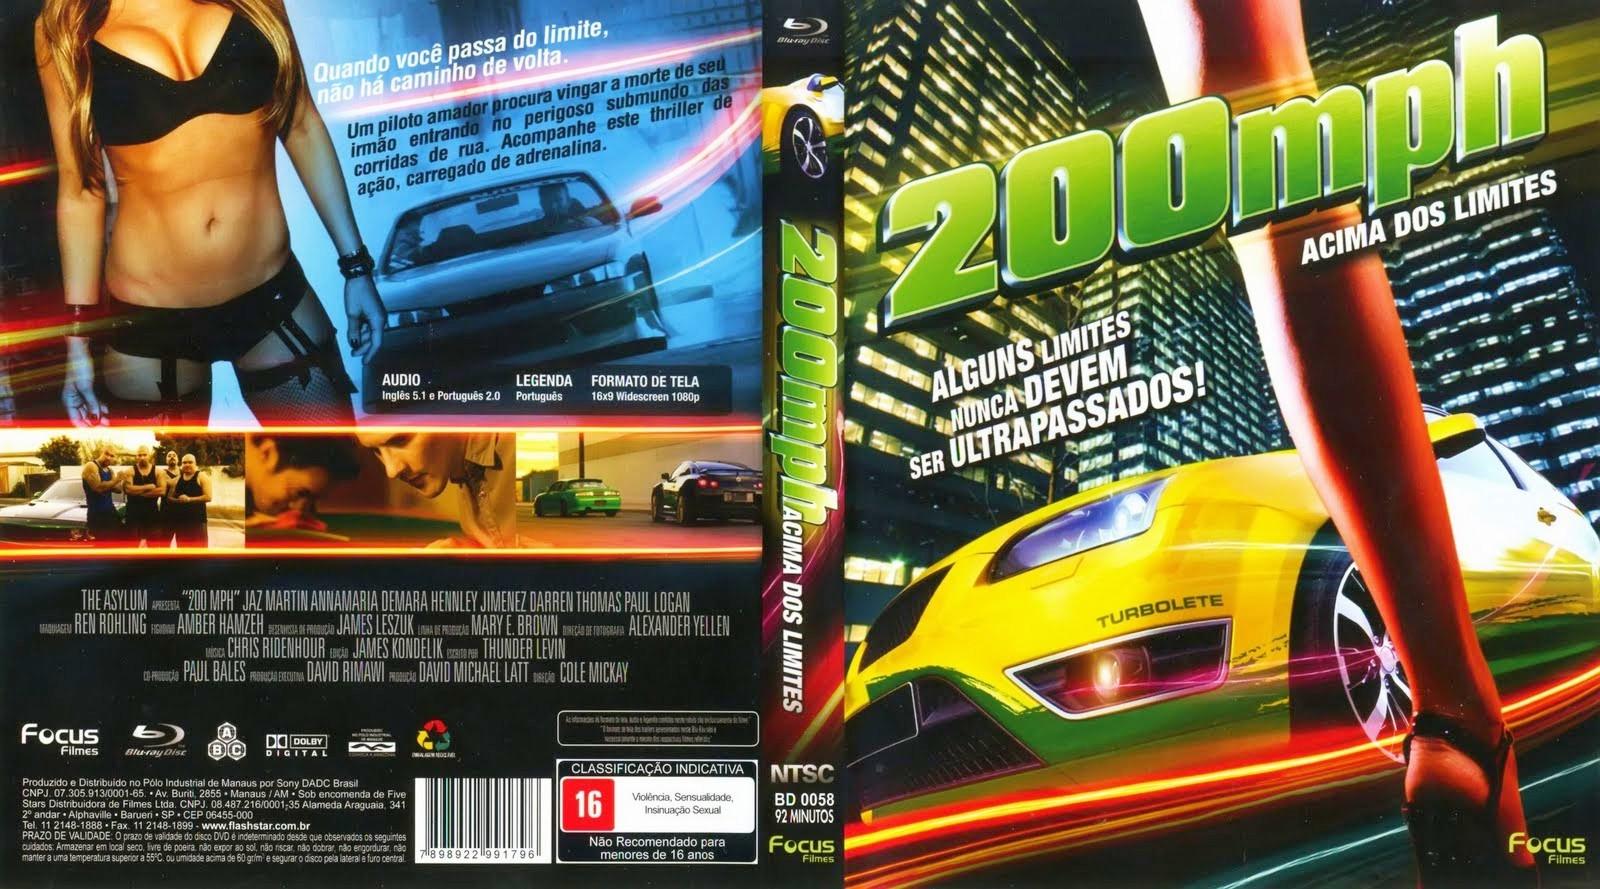 200 Mph Movie free download HD 720p